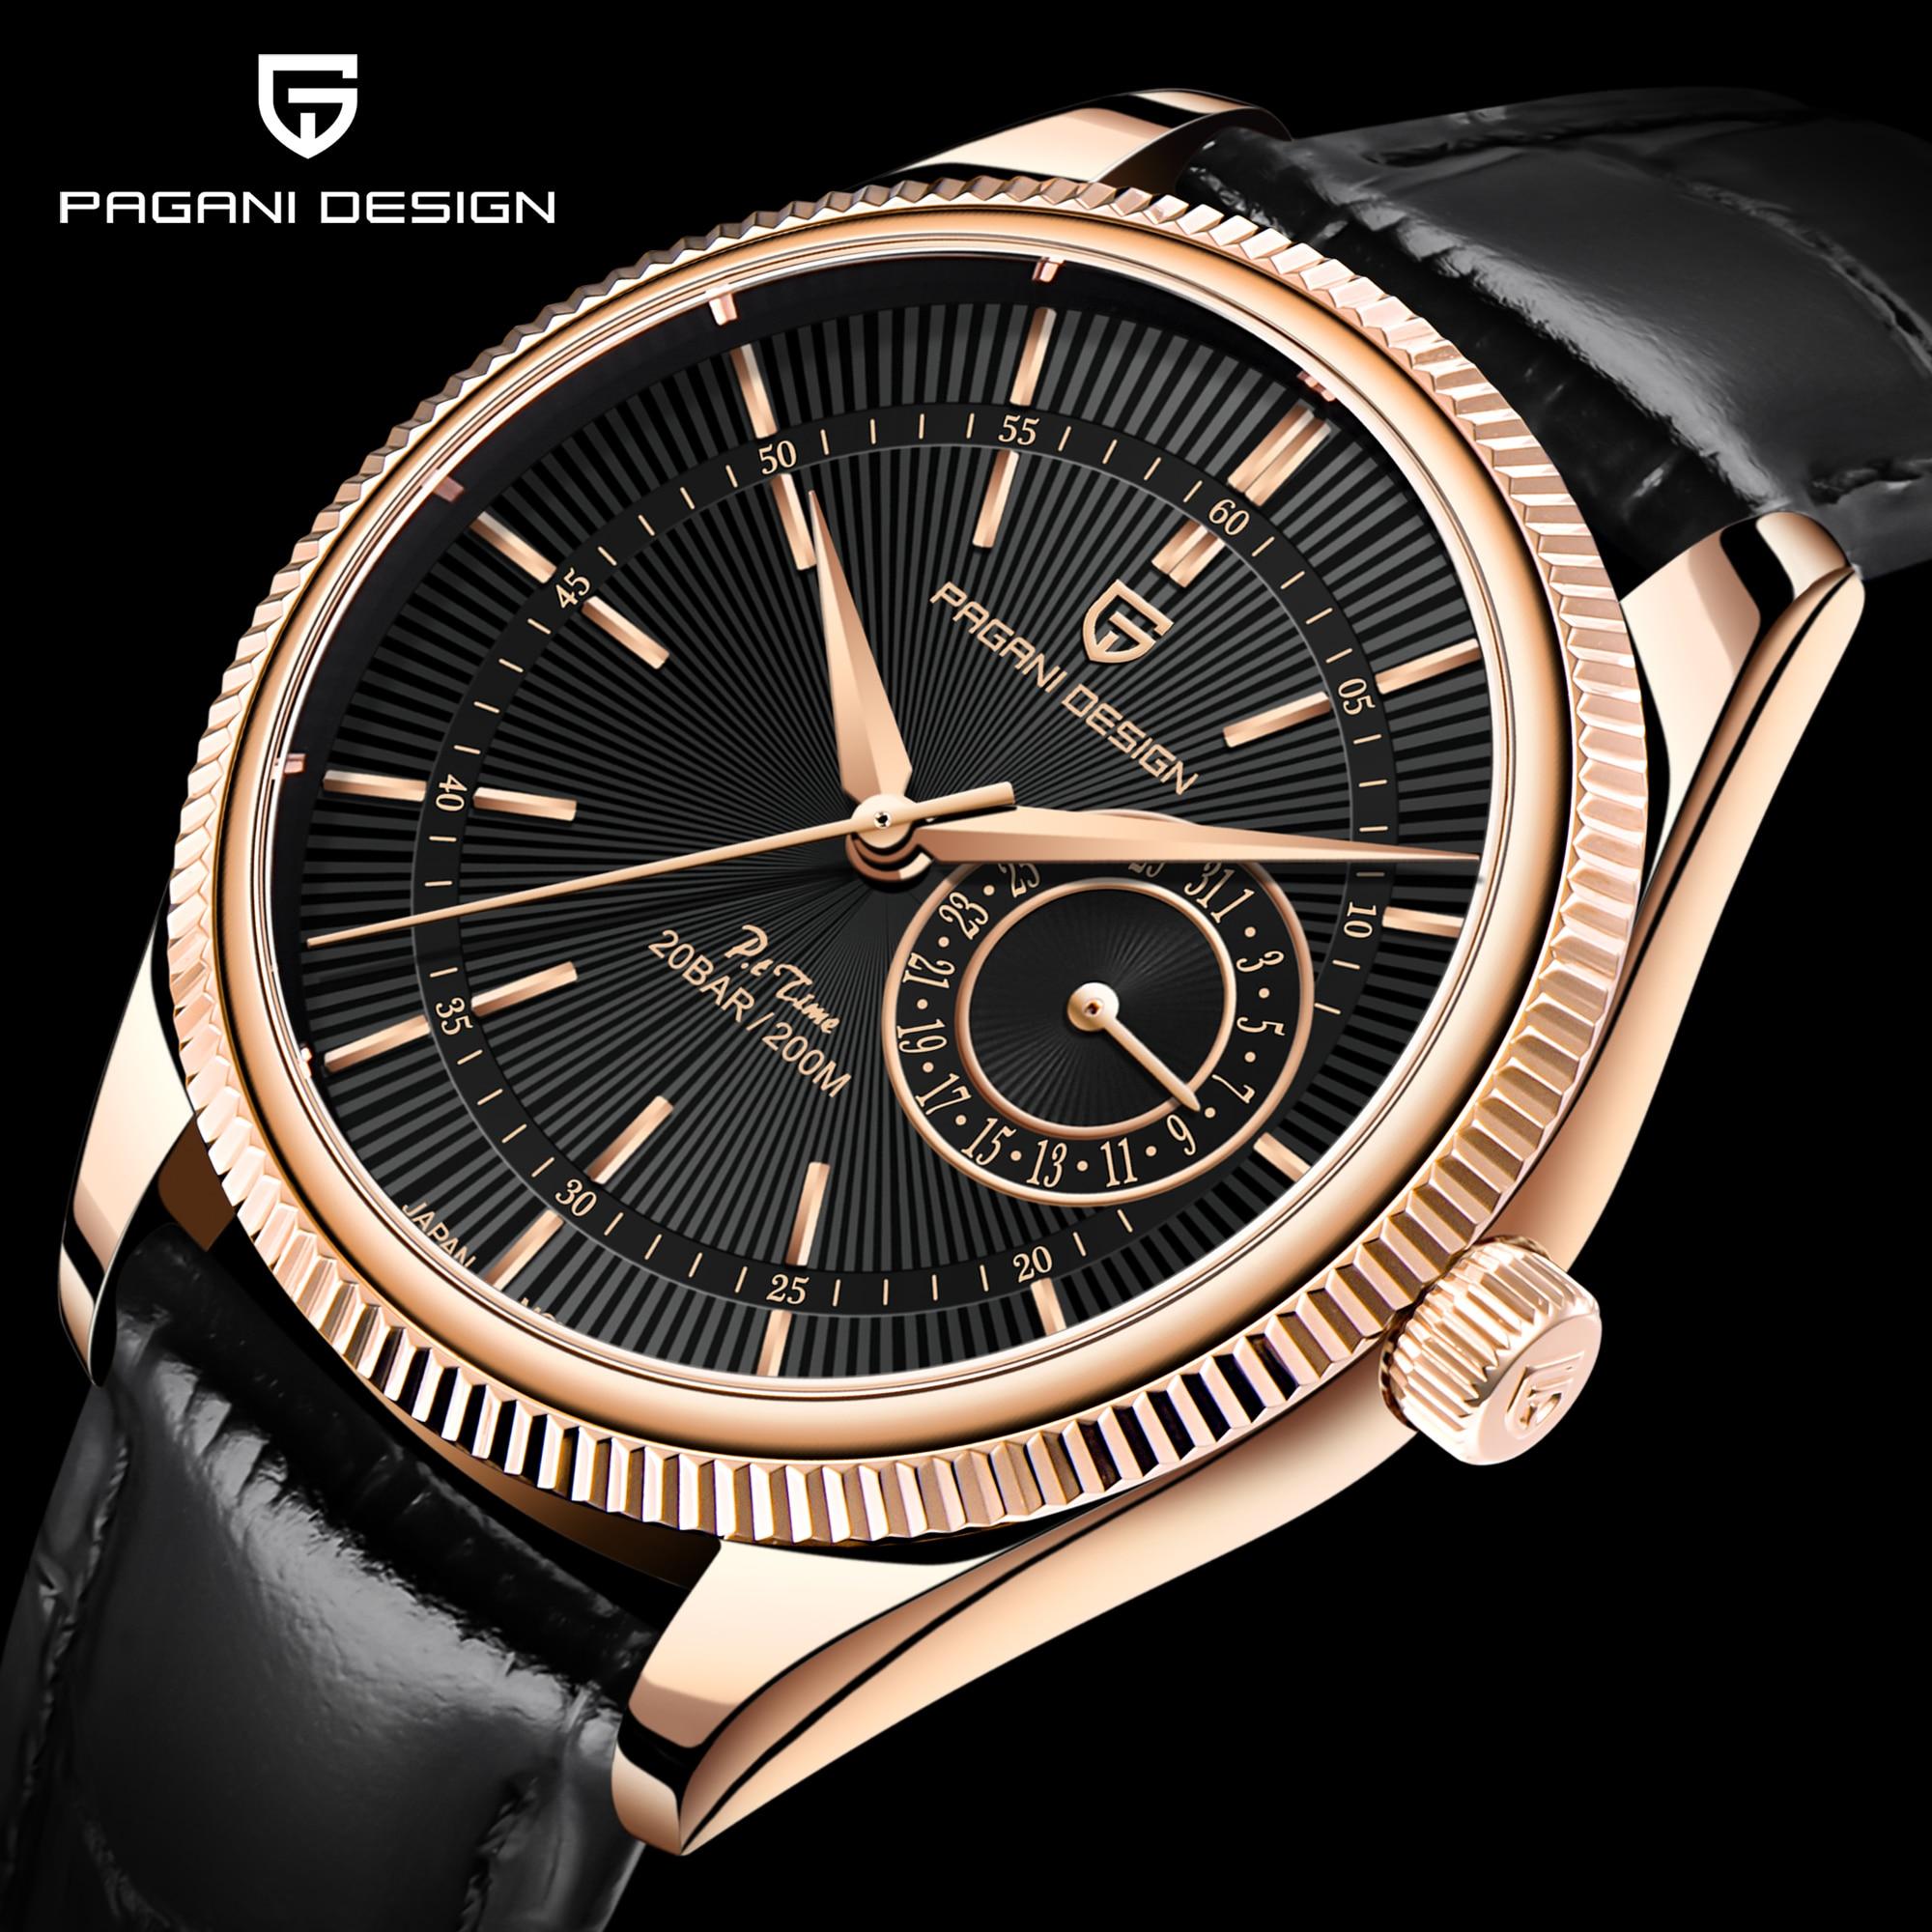 Pagani Design 2021 New Men Quartz Watch Top Brand Watches 200m Automatic Waterproof Clock Luxury Leather Watch Relogio Masculino